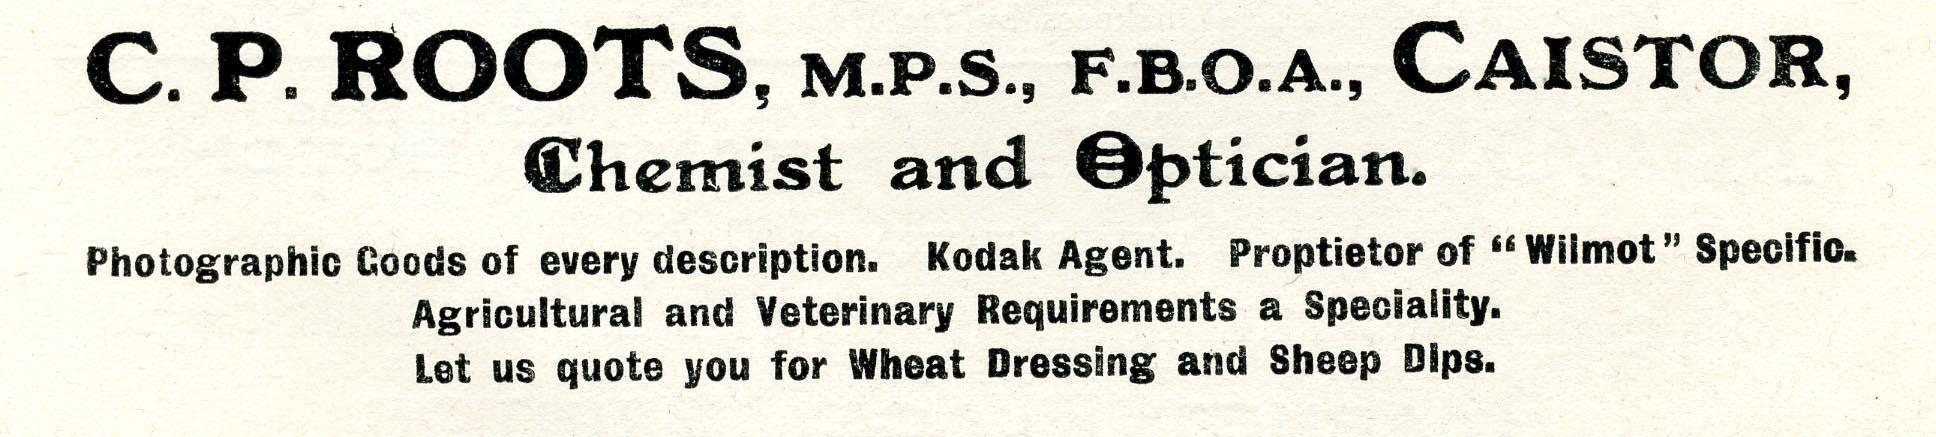 Advert 1934 C P Roots.jpg